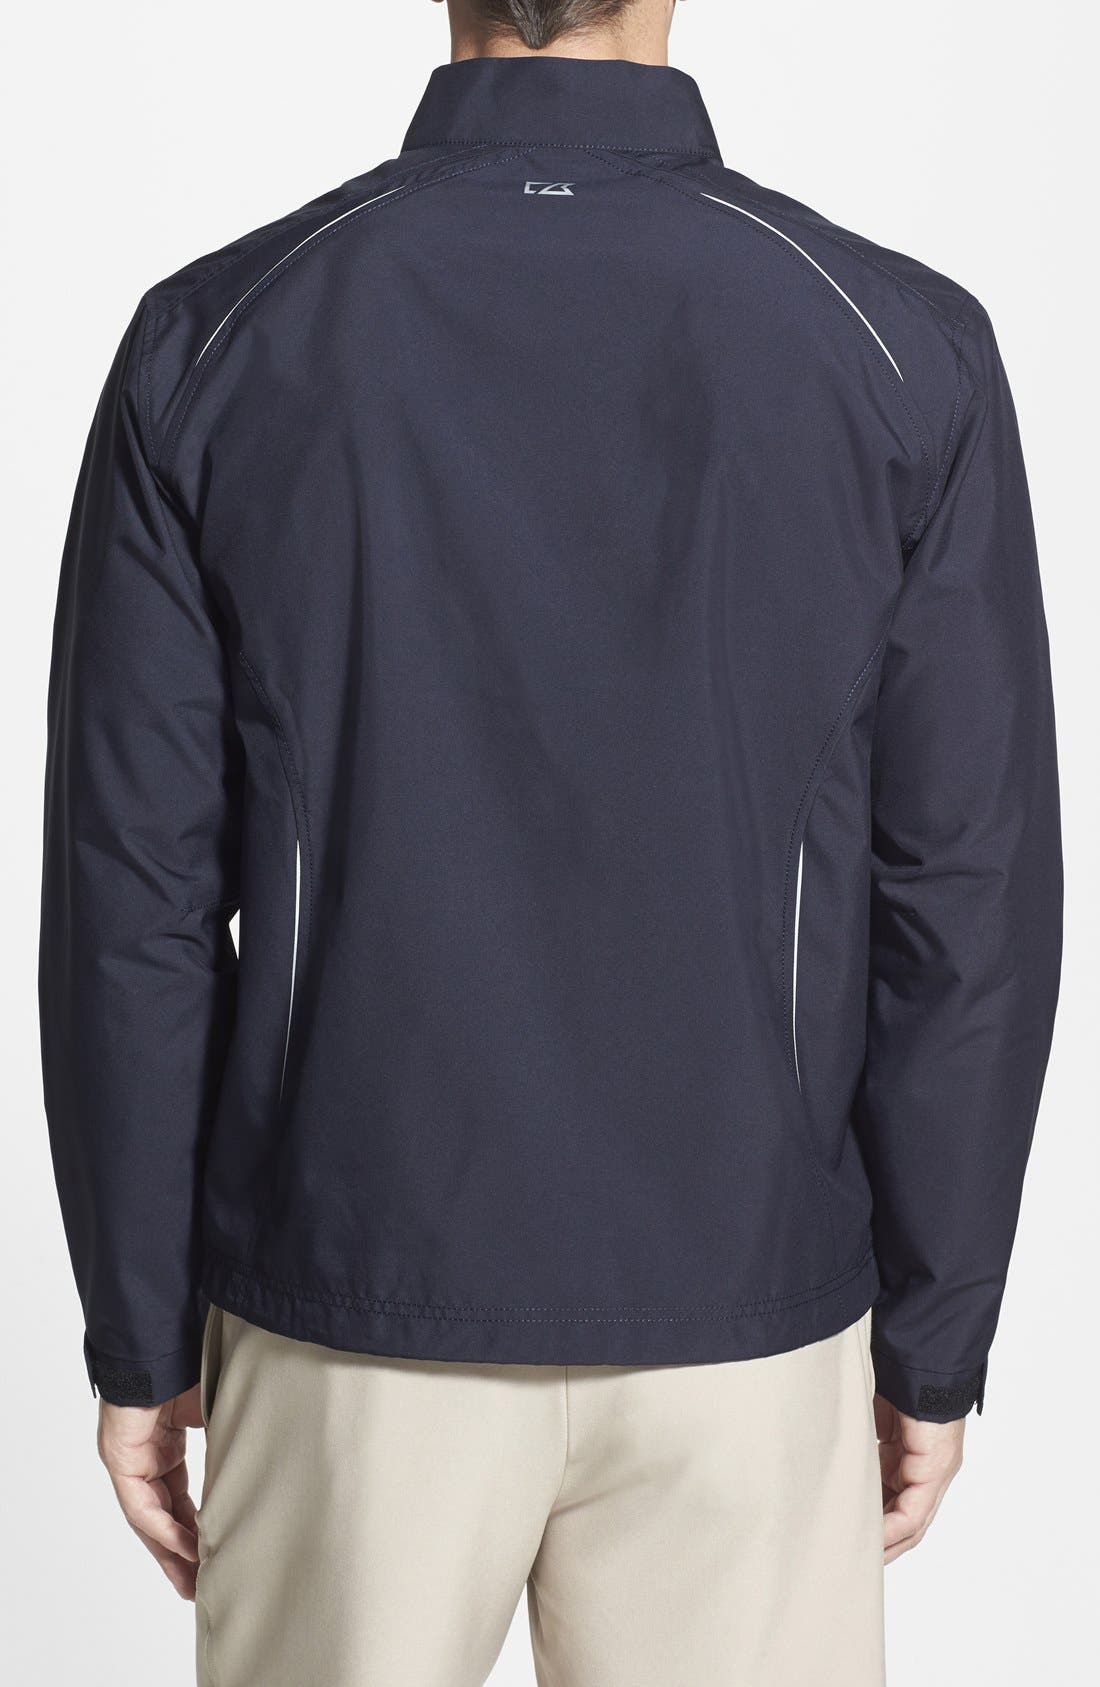 New England Patriots - Beacon WeatherTec Wind & Water Resistant Jacket,                             Alternate thumbnail 2, color,                             Navy Blue